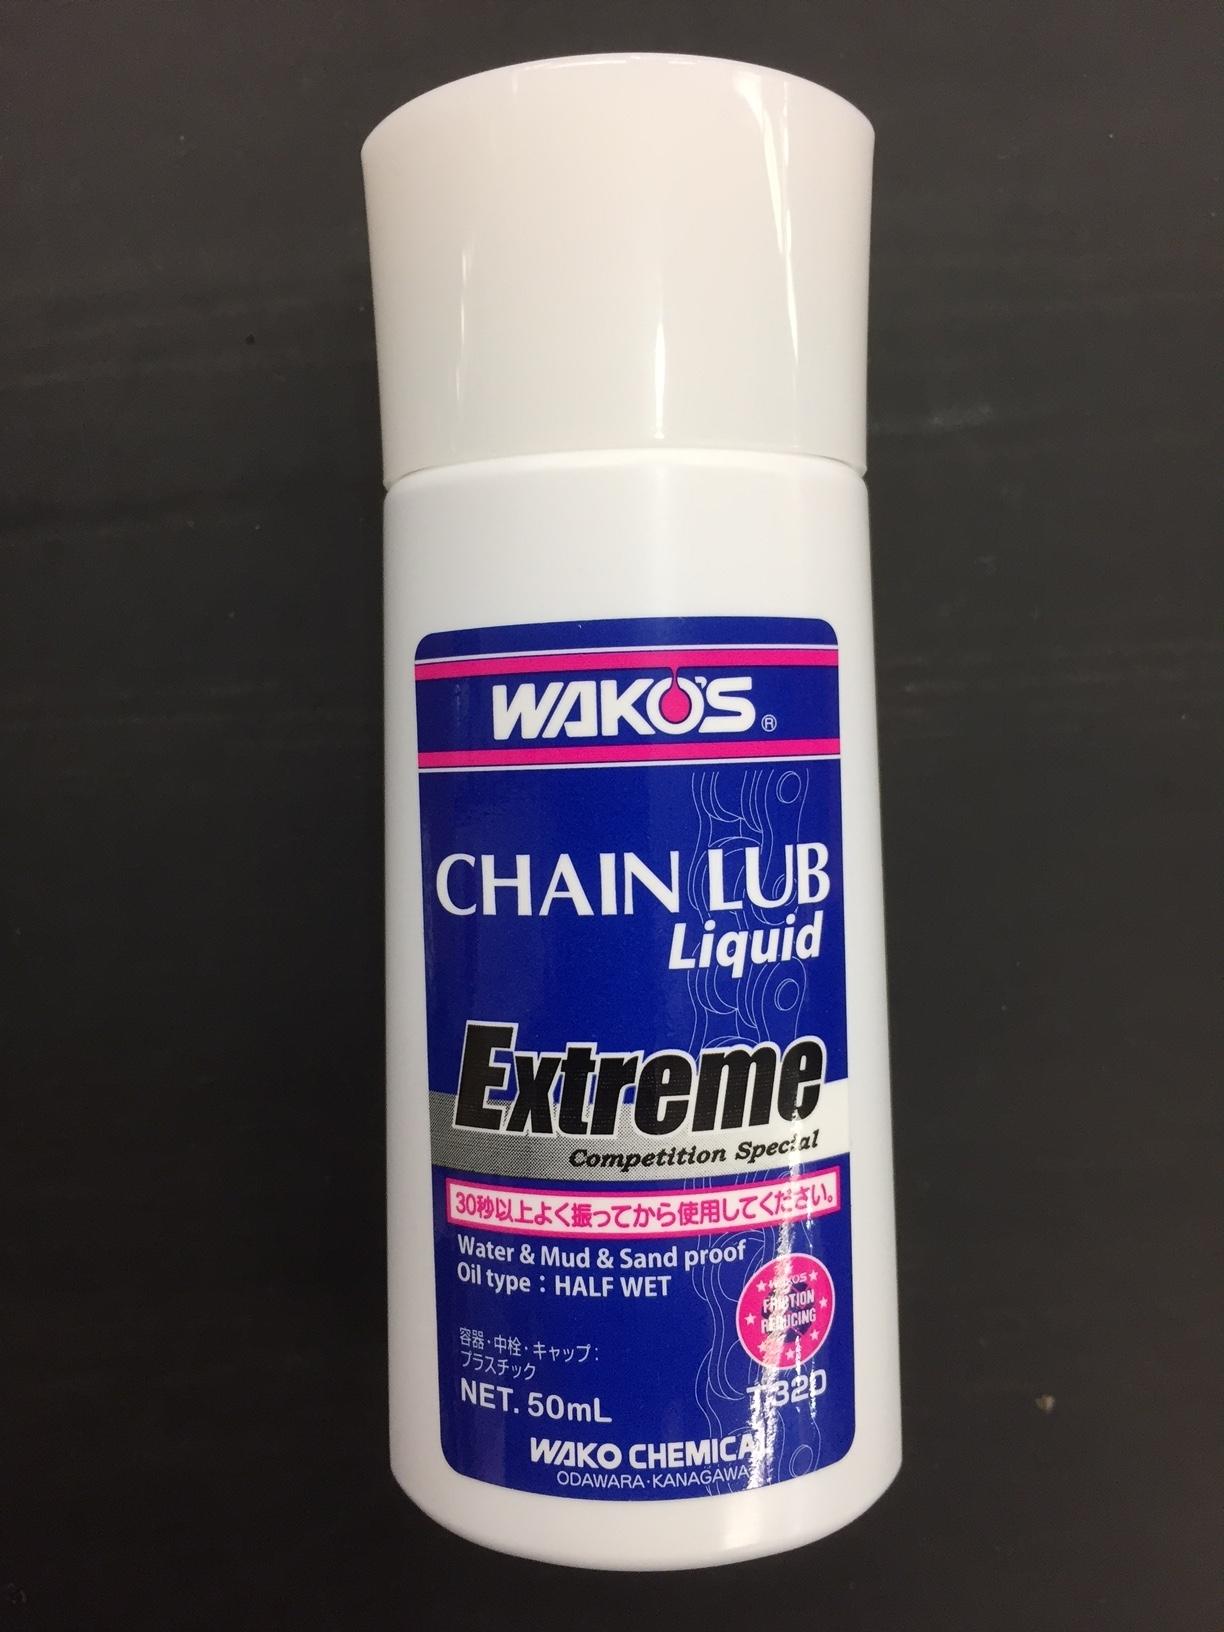 WAKOS-CHAINLUB-Liquid-Extreme-1.jpg